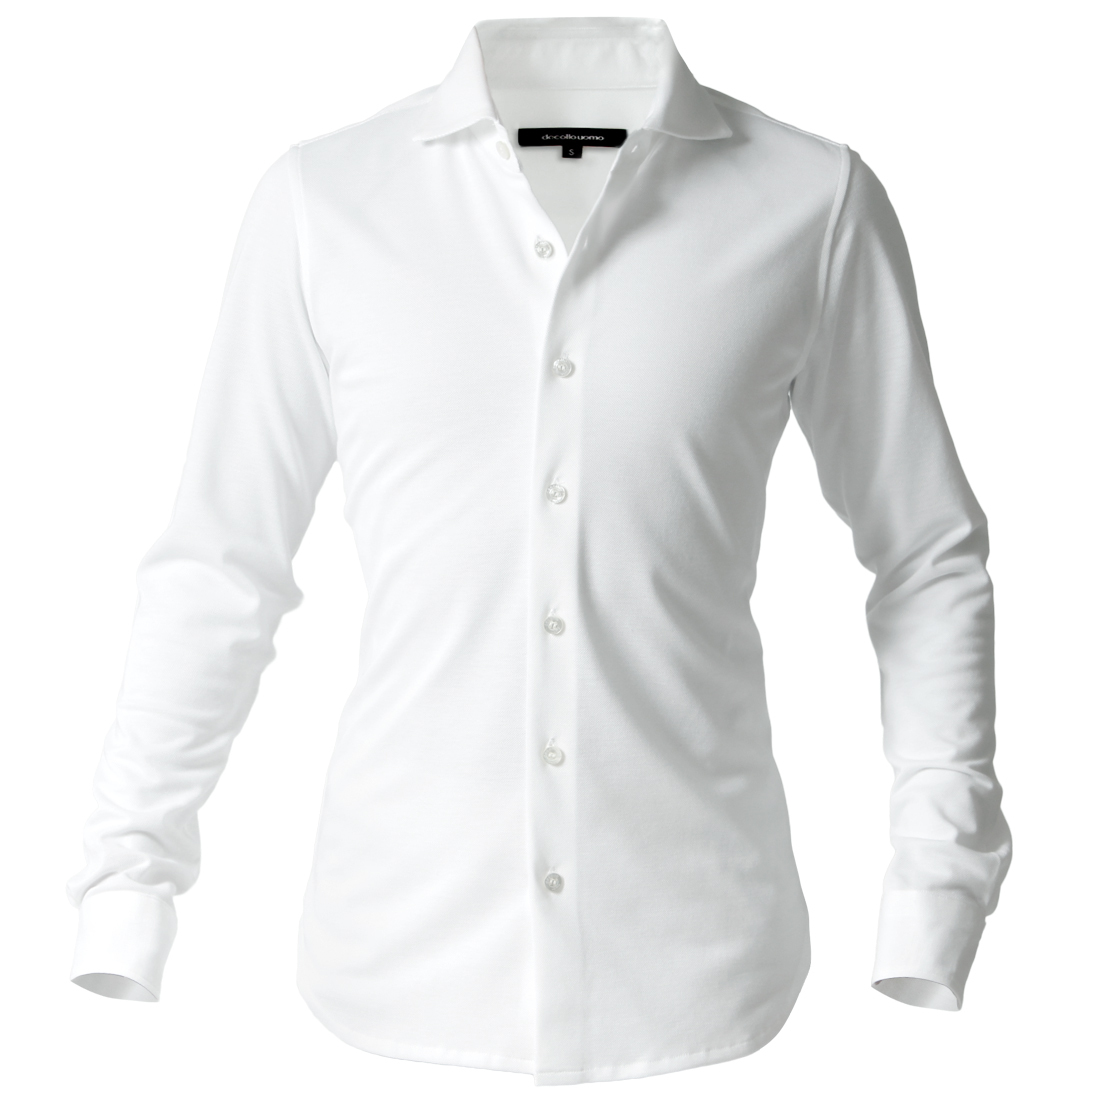 DJS-002 decollouomo メンズドレスシャツ 長袖 concorde - ピュアホワイト